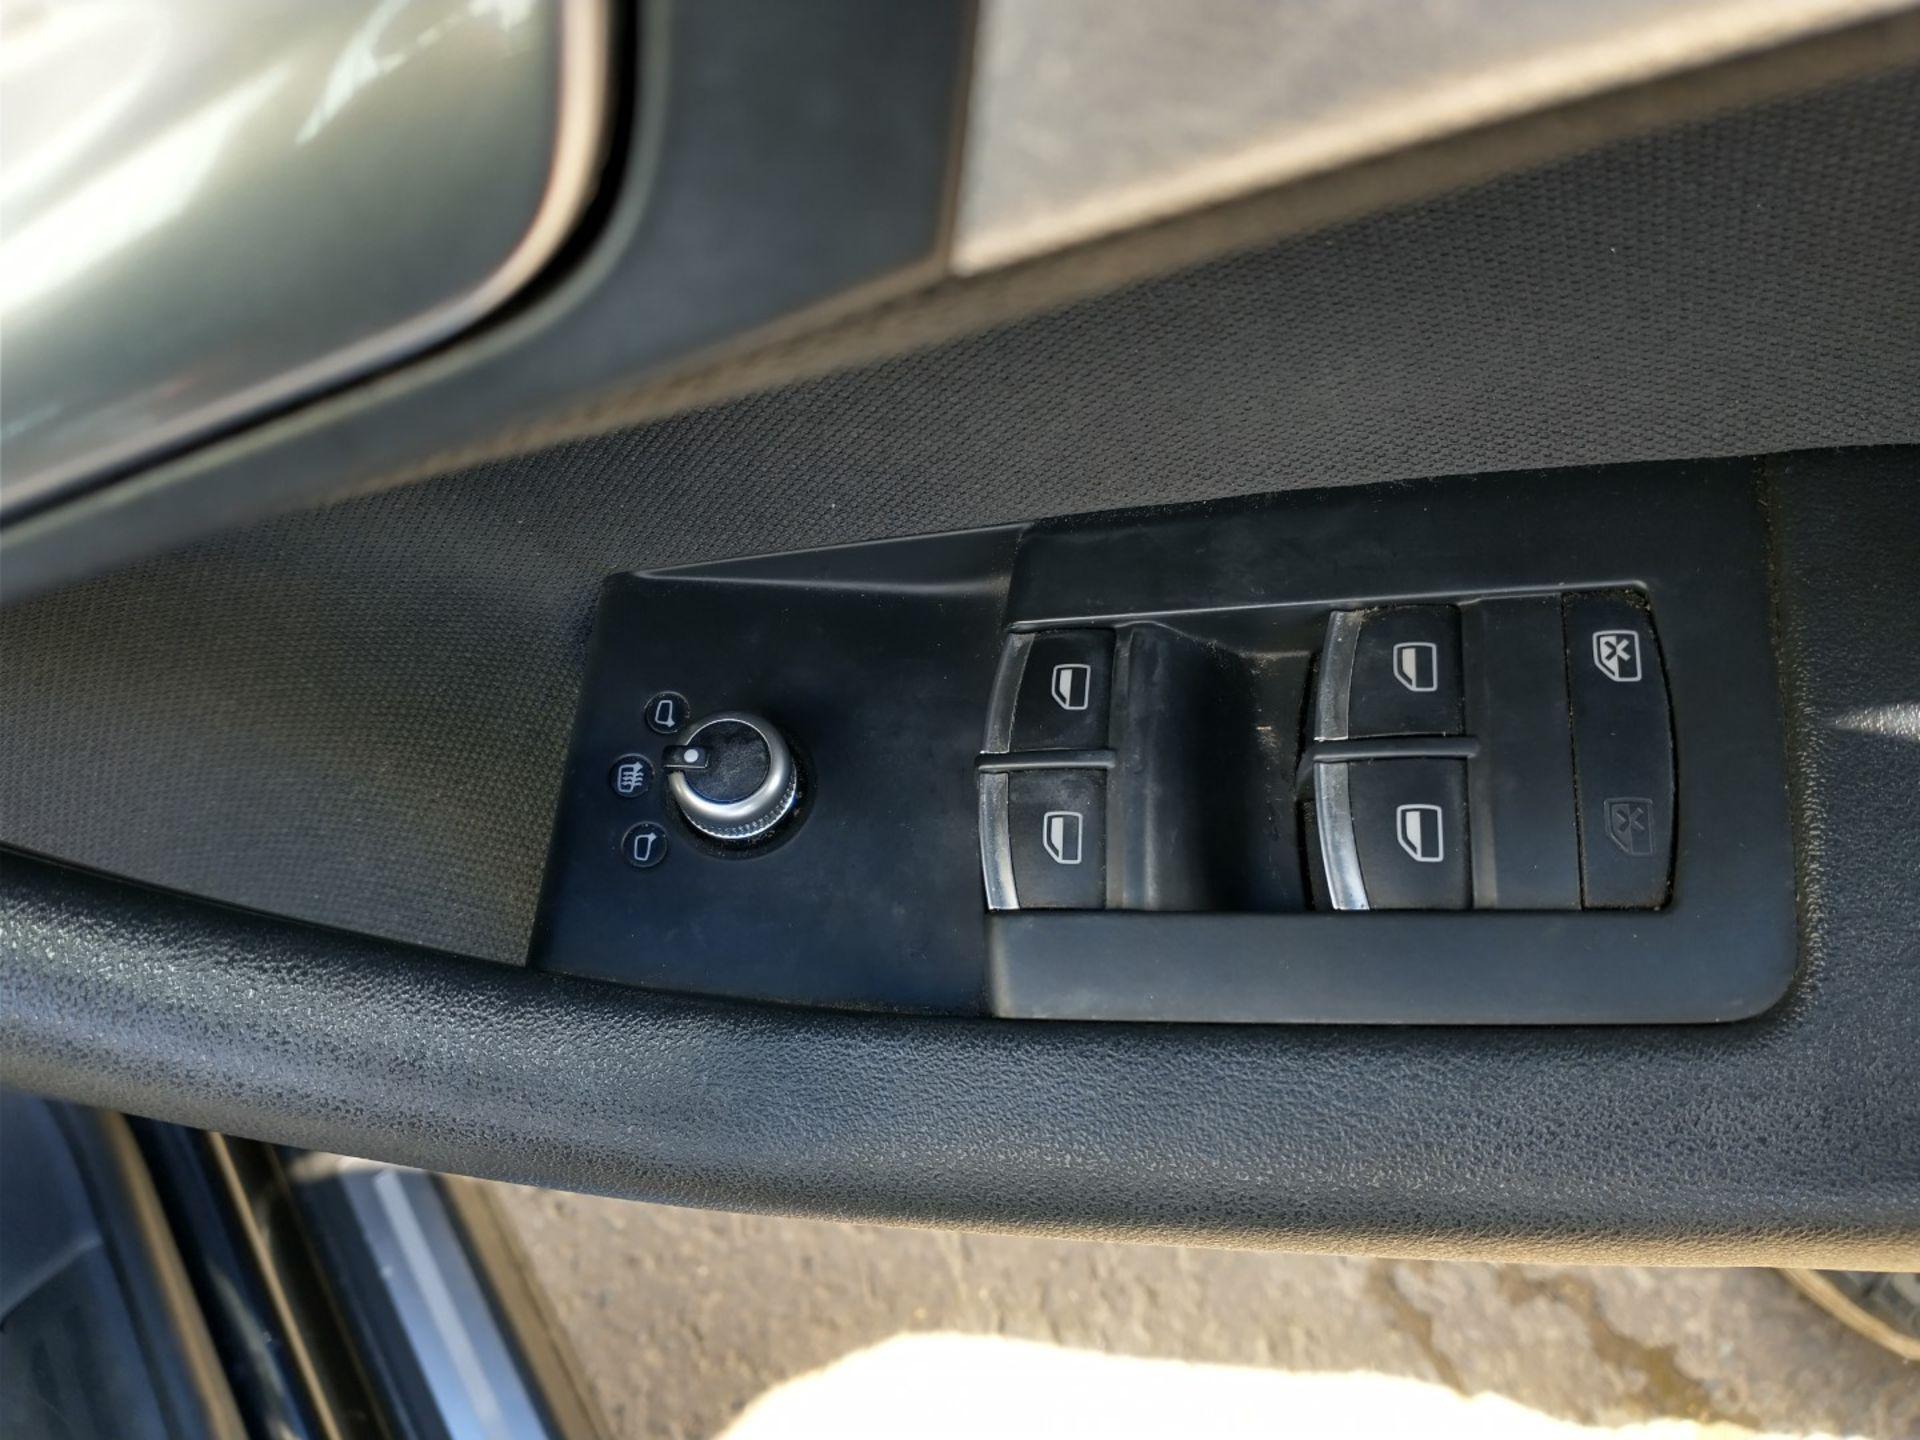 2012 Audi A3 Sportback 1.6 Tdi Hatchback - Full Service History - CL505 - NO VAT ON THE HAMMER - - Image 5 of 26